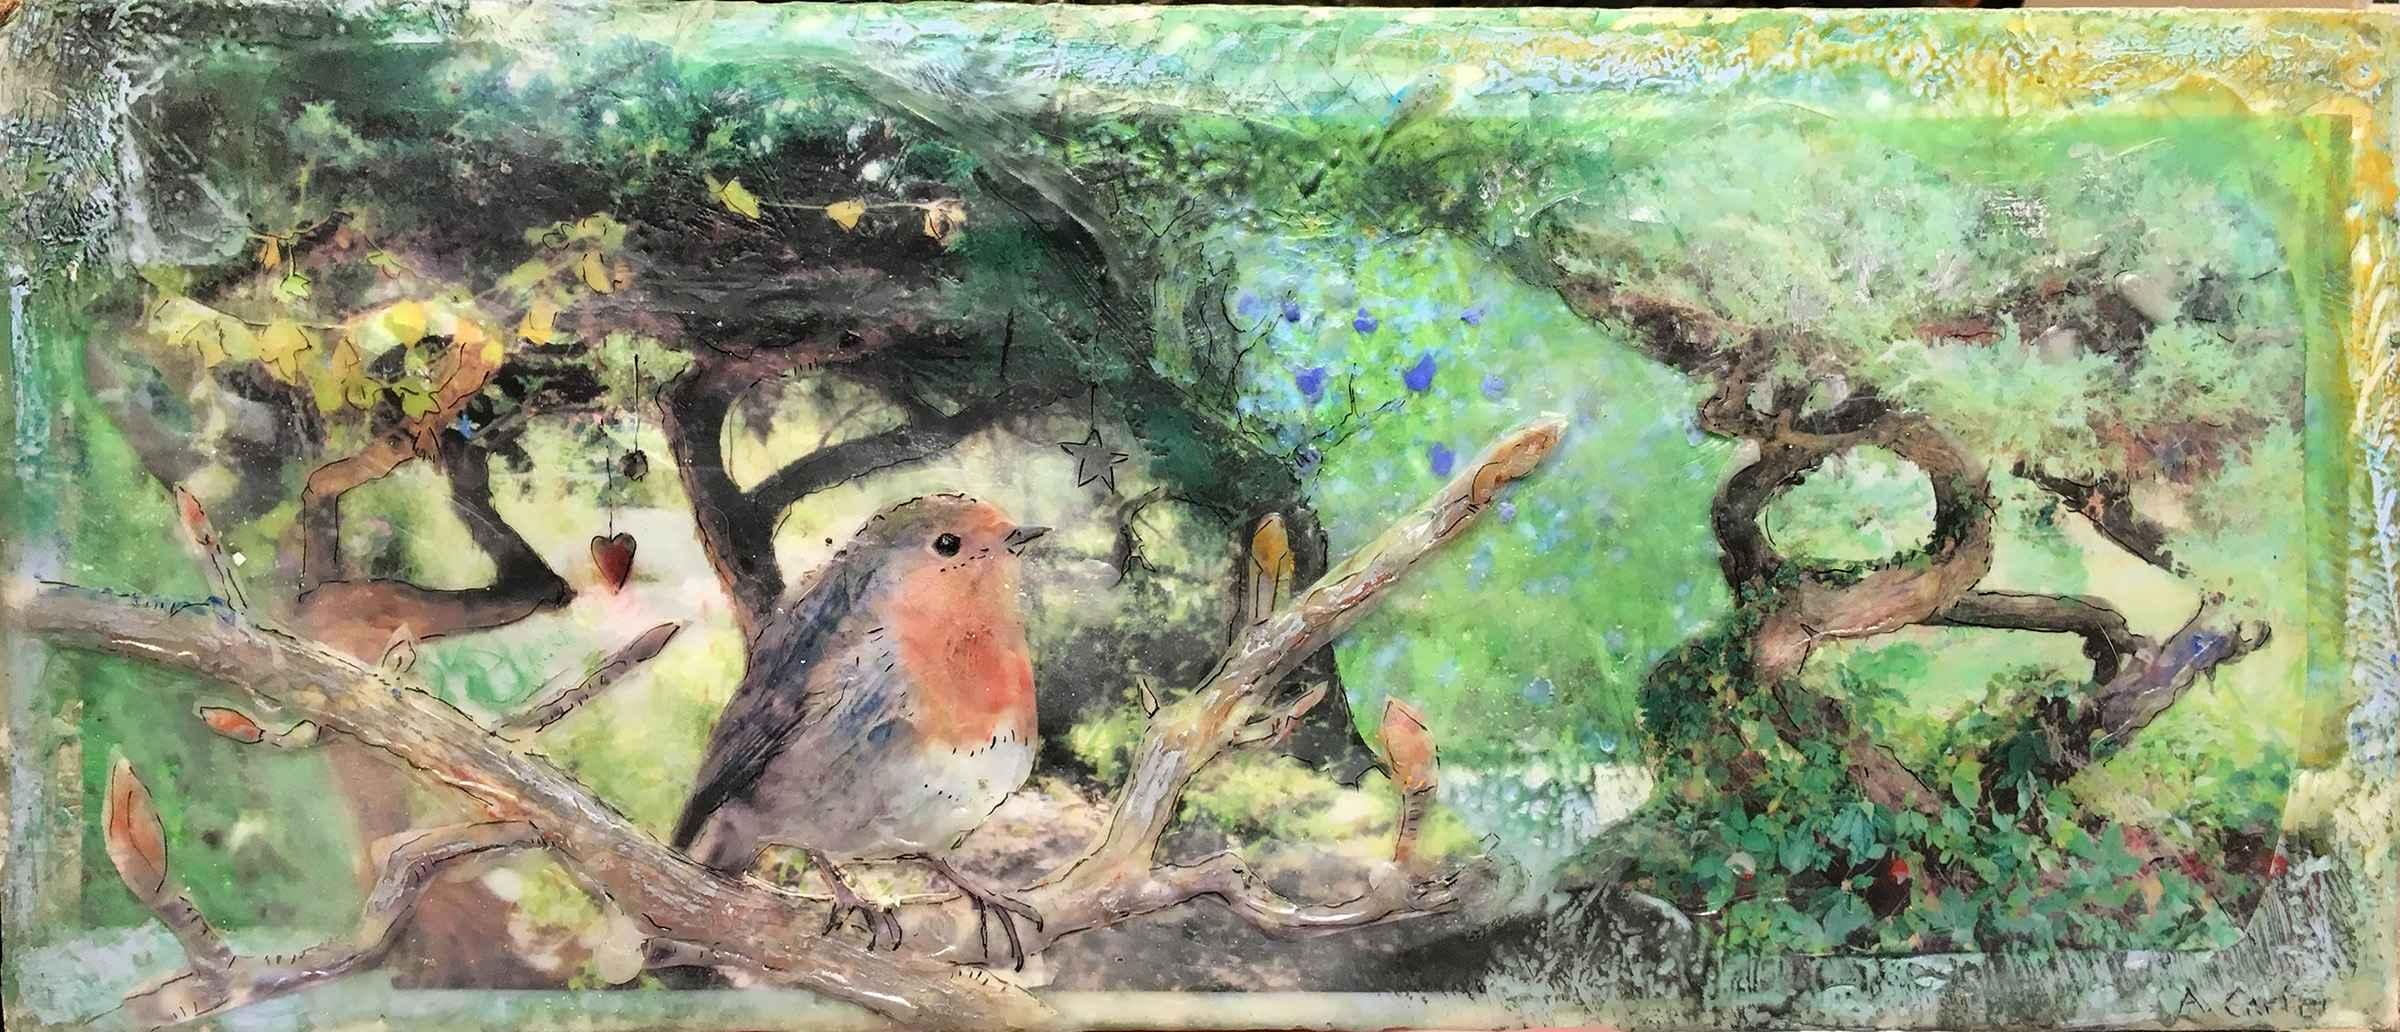 Where the Fairies Play by  Ann L. Carter - Masterpiece Online